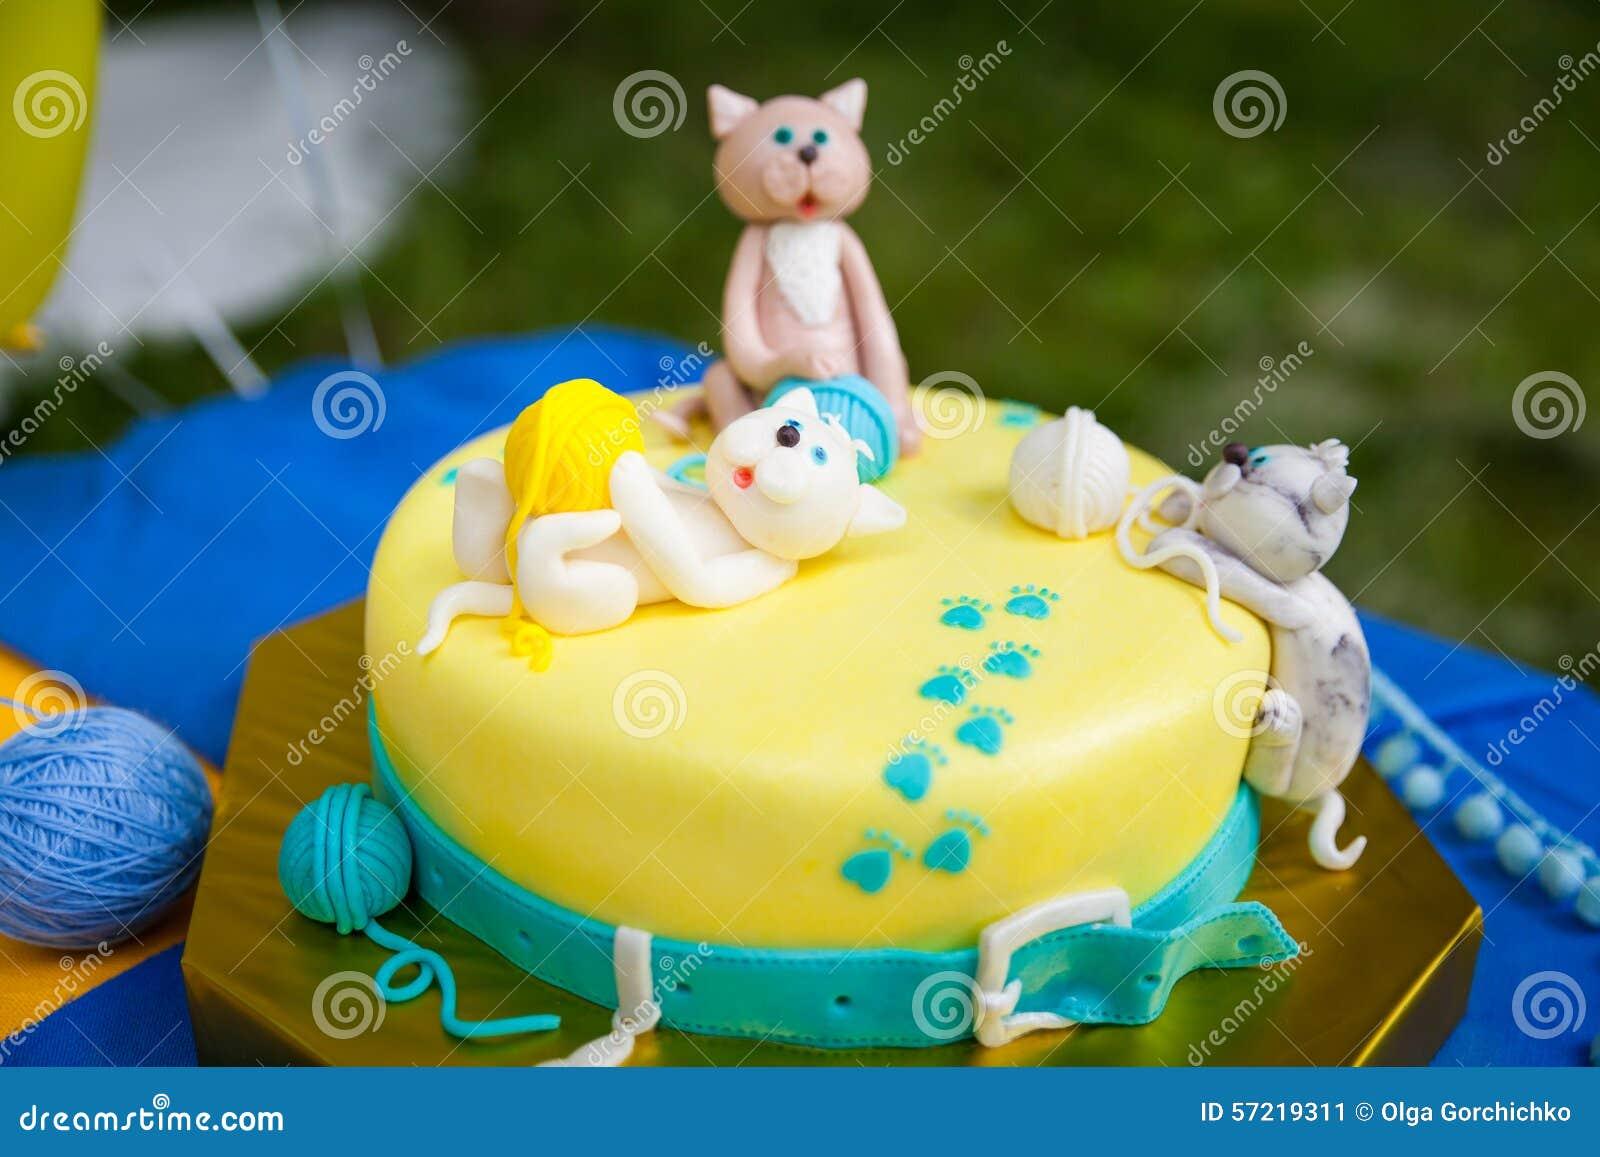 Birthday Cake With Kittens And Yarn Balls Stock Image